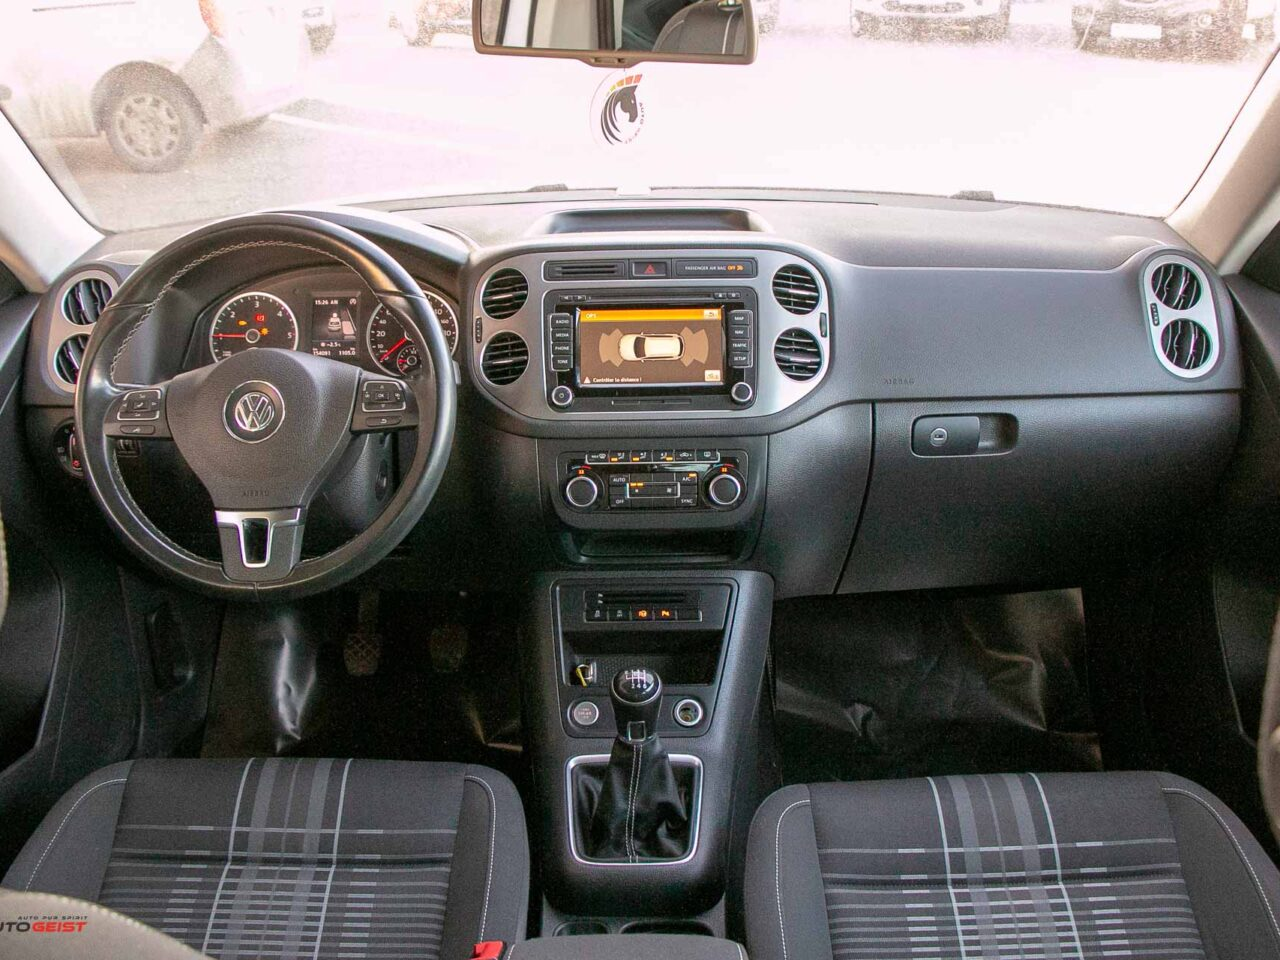 VW-TIGUAN-2015-manual-3660